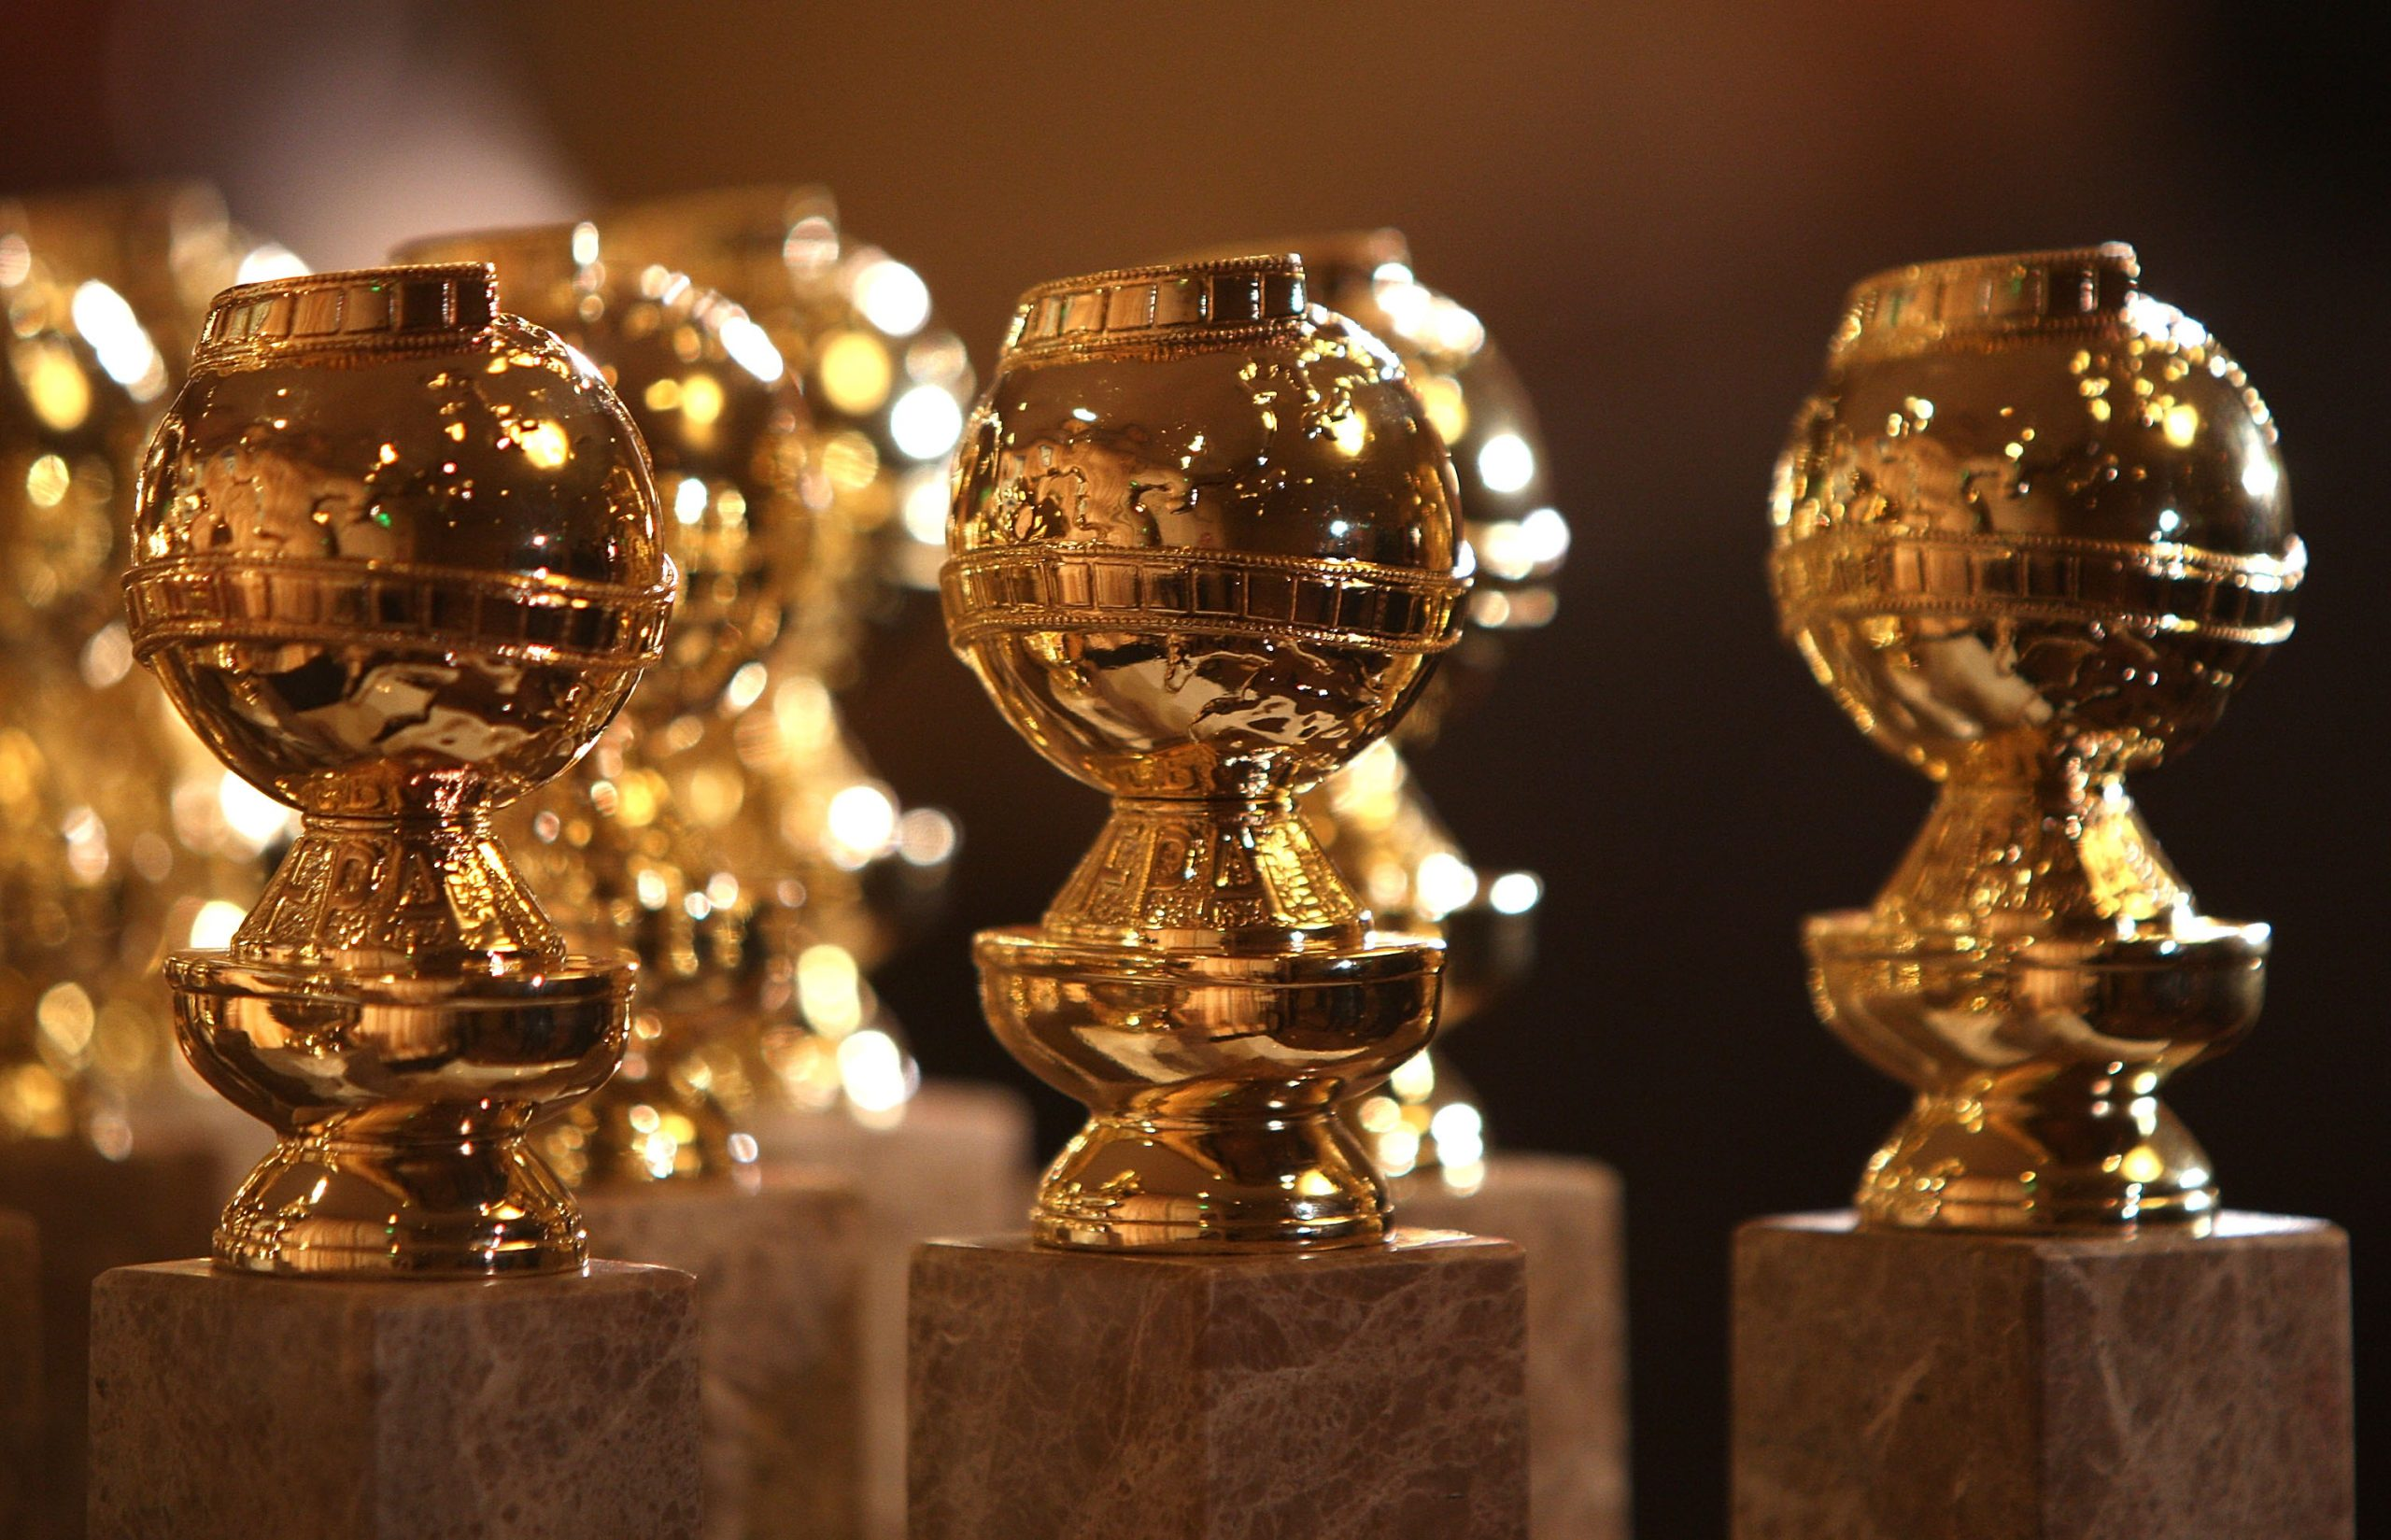 golden globes score